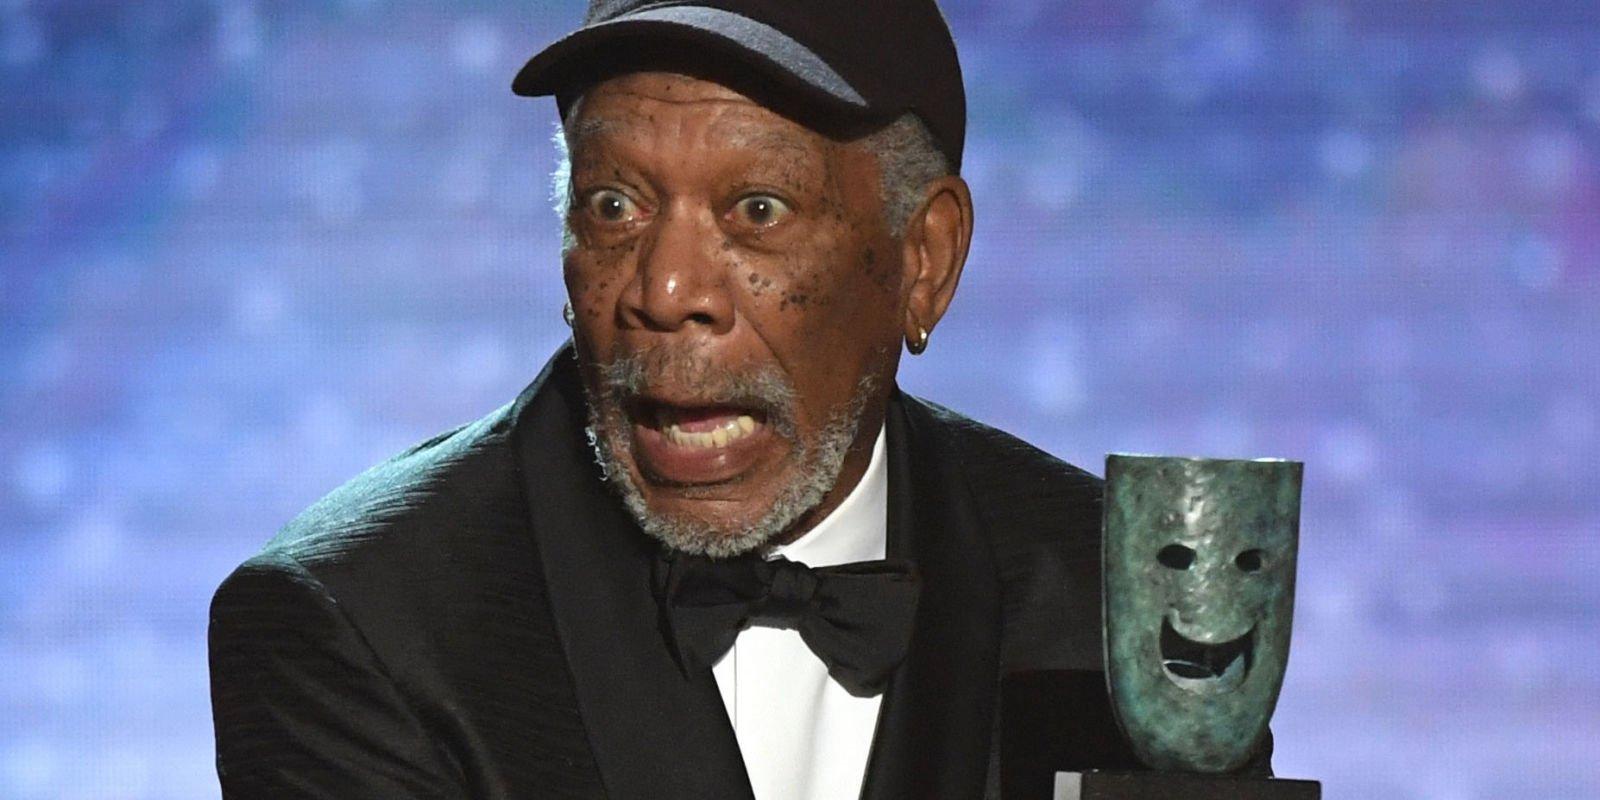 morgan freeman says hi landscape 1516609766 morgan freeman sag awards - Morgan Freeman interrompt son discours aux SAG Awards et tout le monde se demande pourquoi